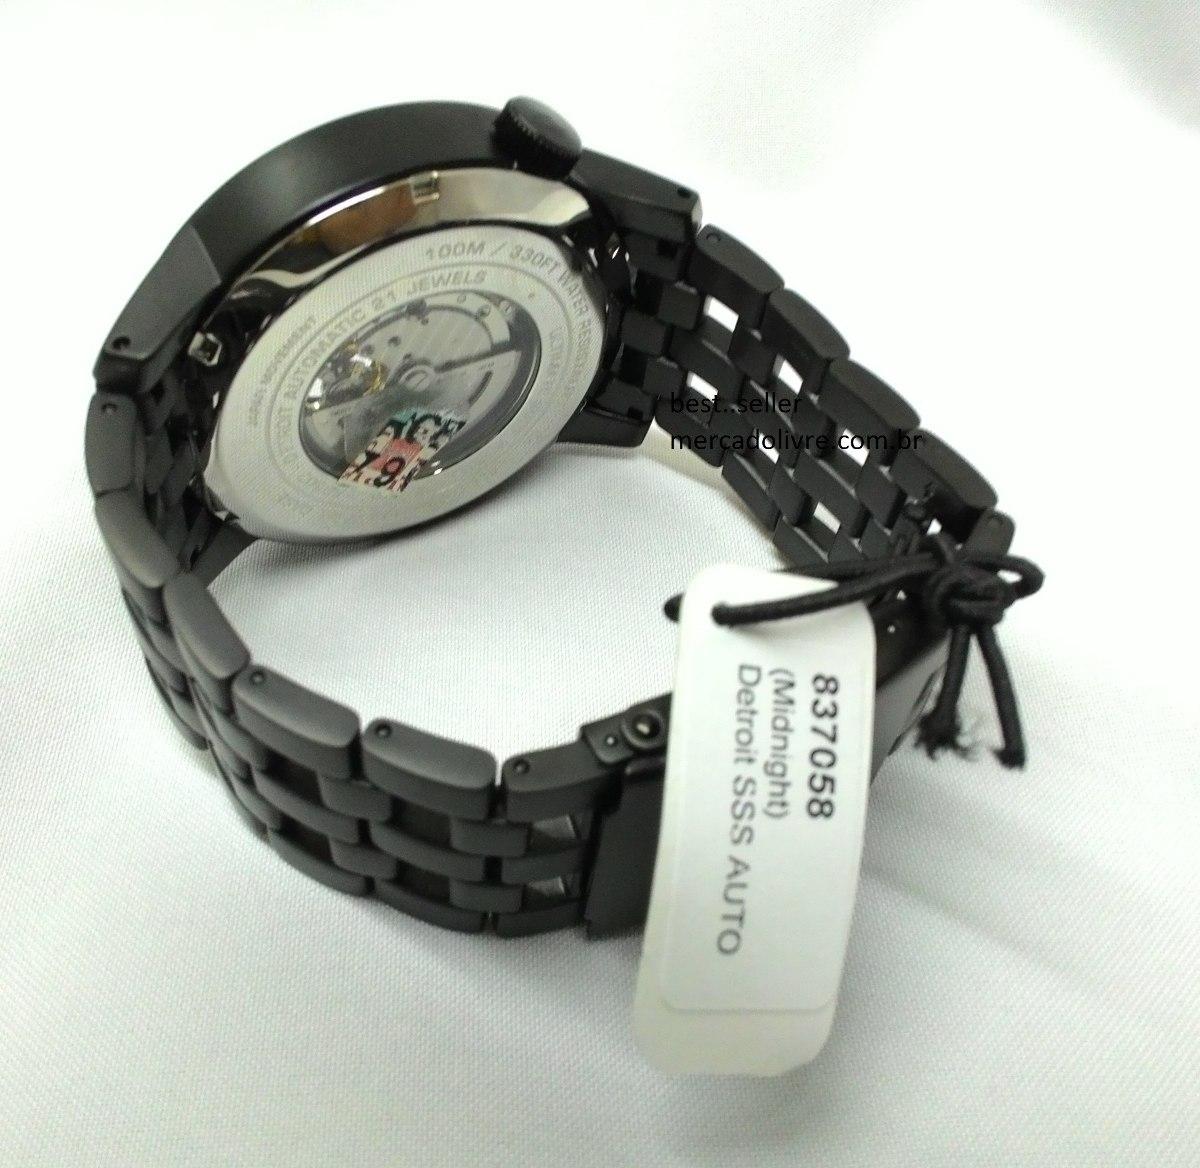 5273f91fbc6 Relógio Rip Curl Detroit Automatic Midnight Black Preto 2507 - R ...